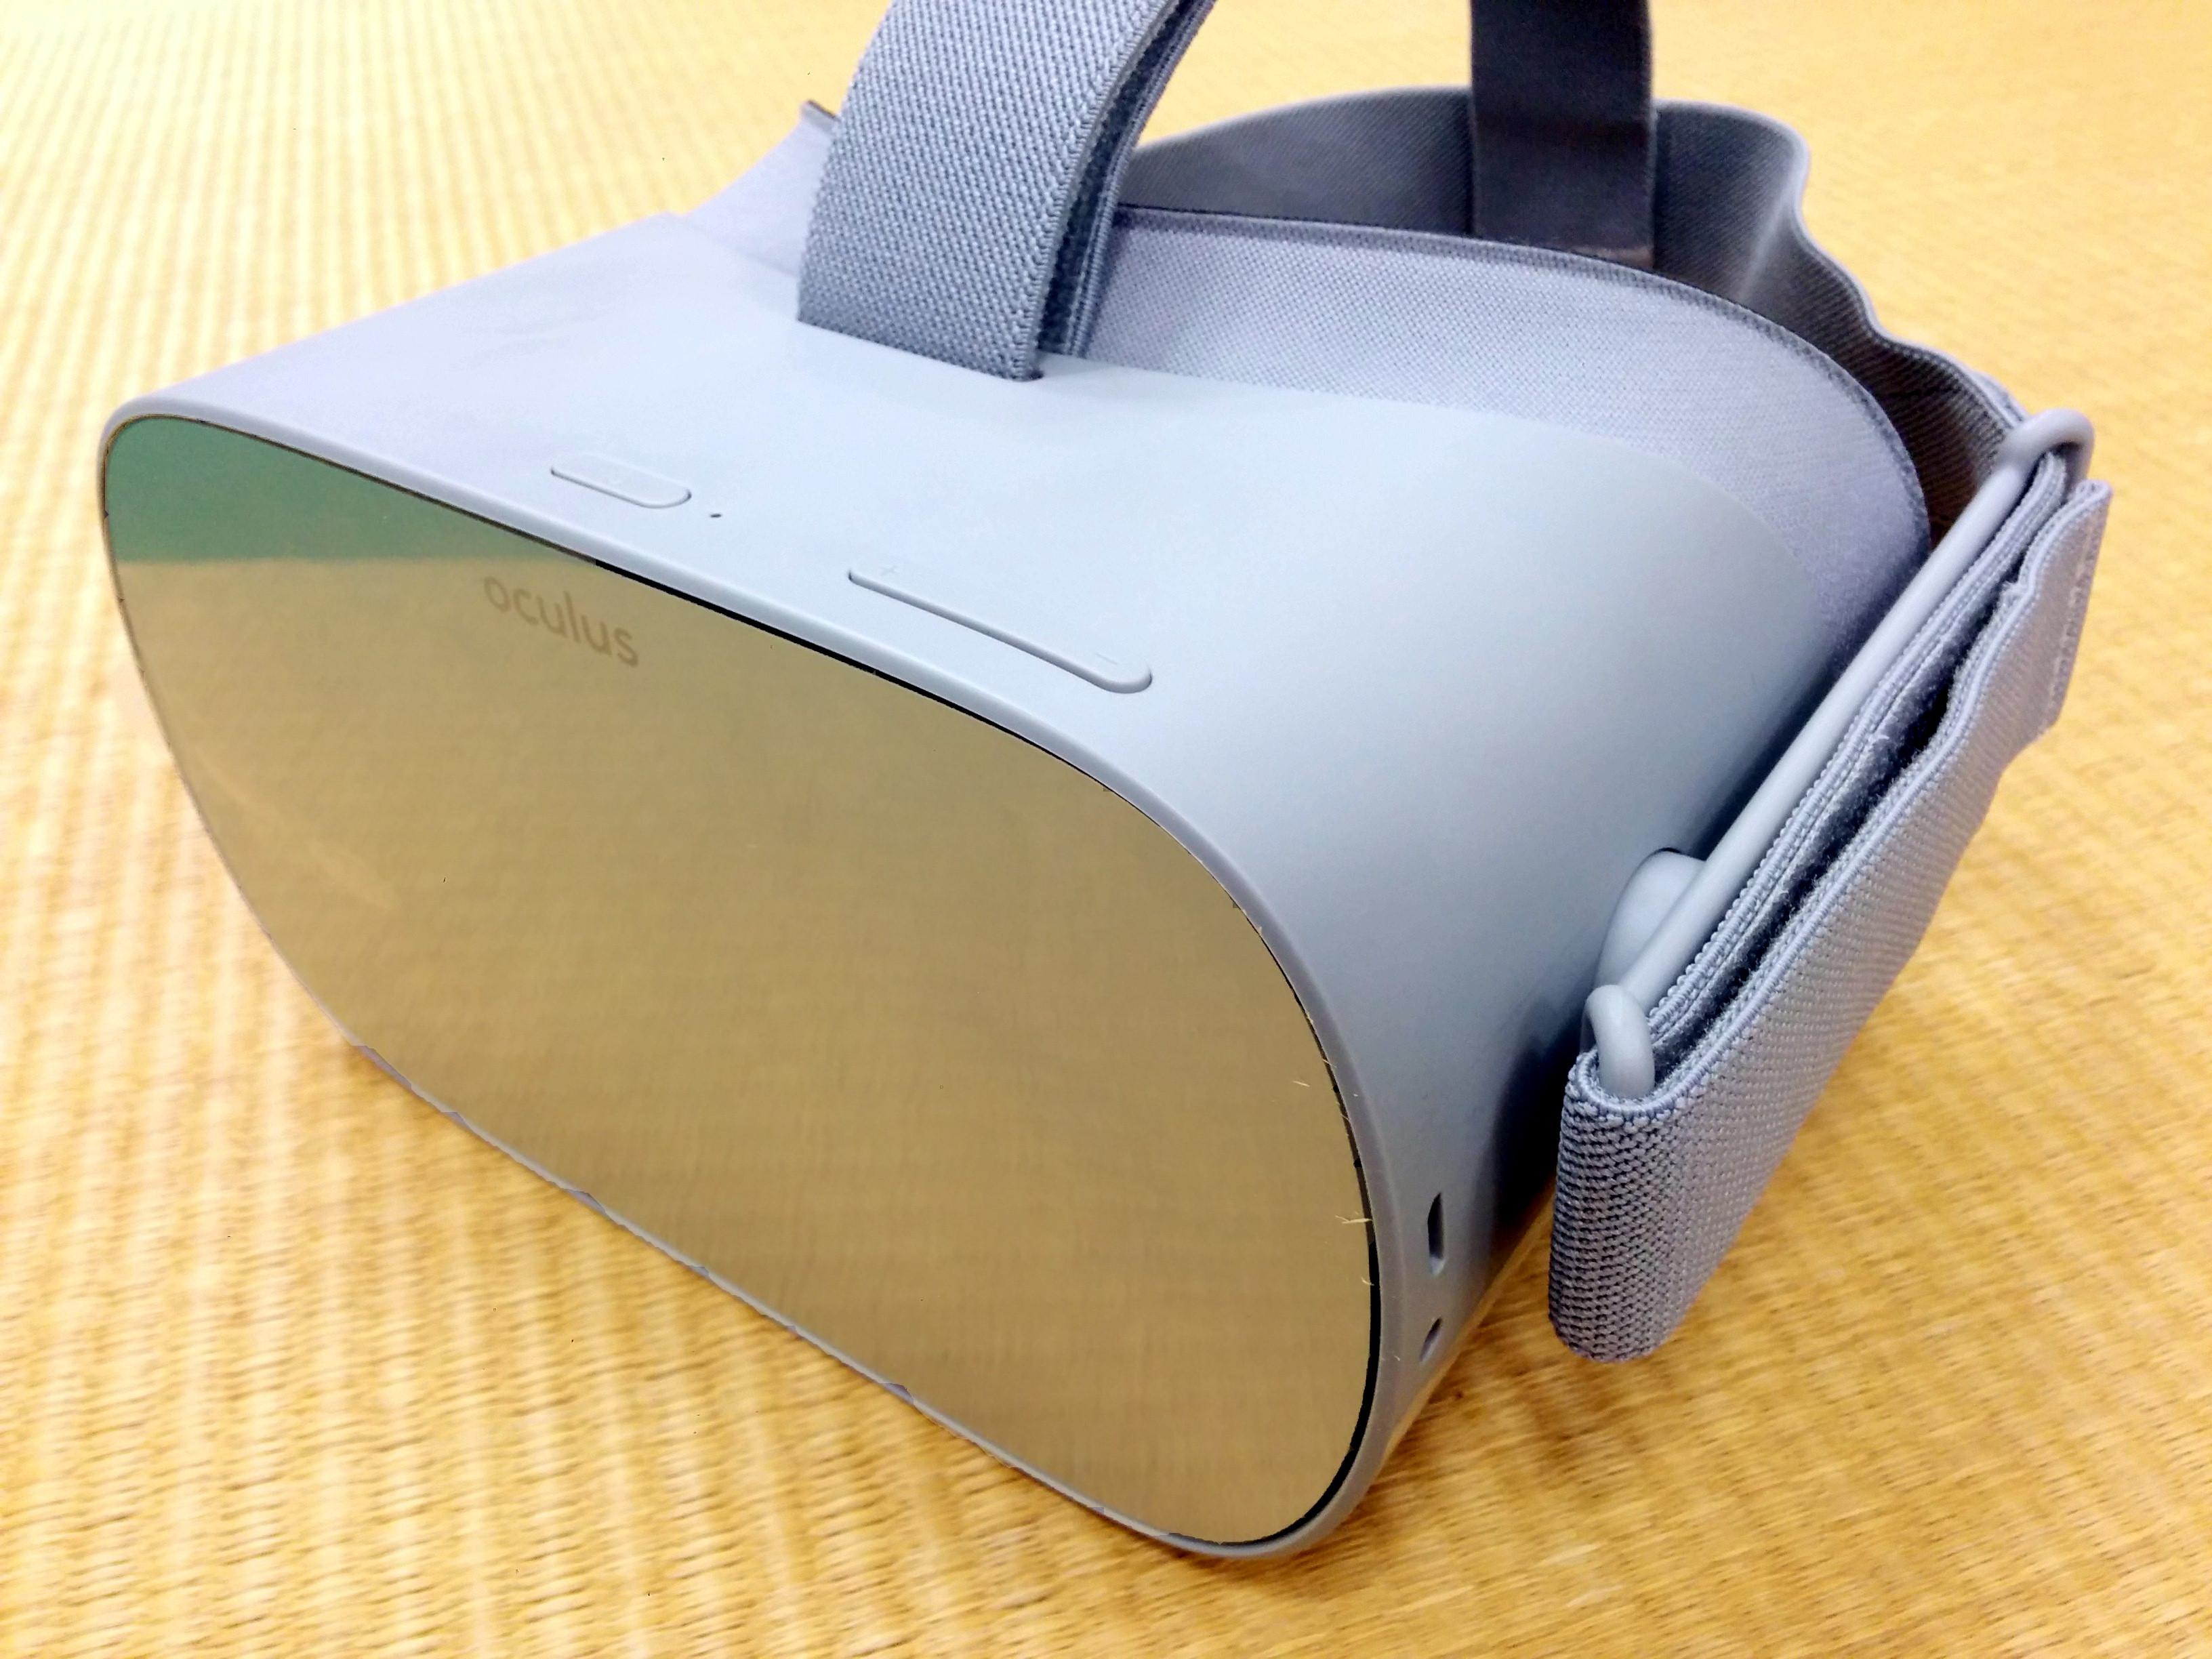 Oculus Go - Wikipedia